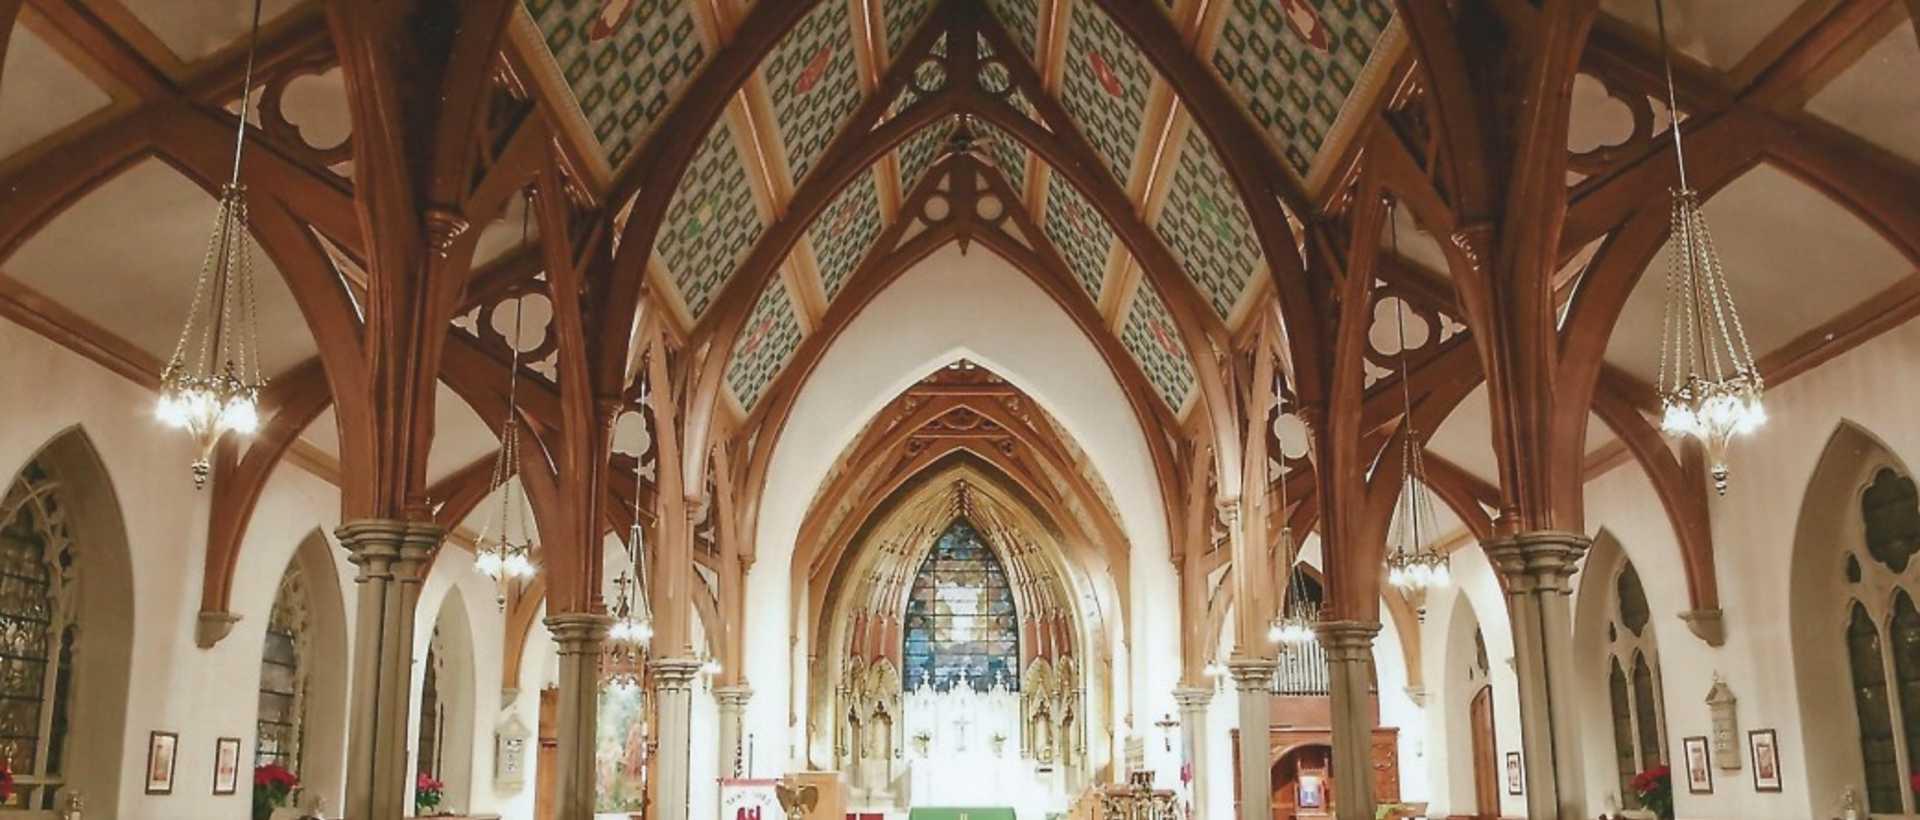 St Luke's Church in Scranton, PA